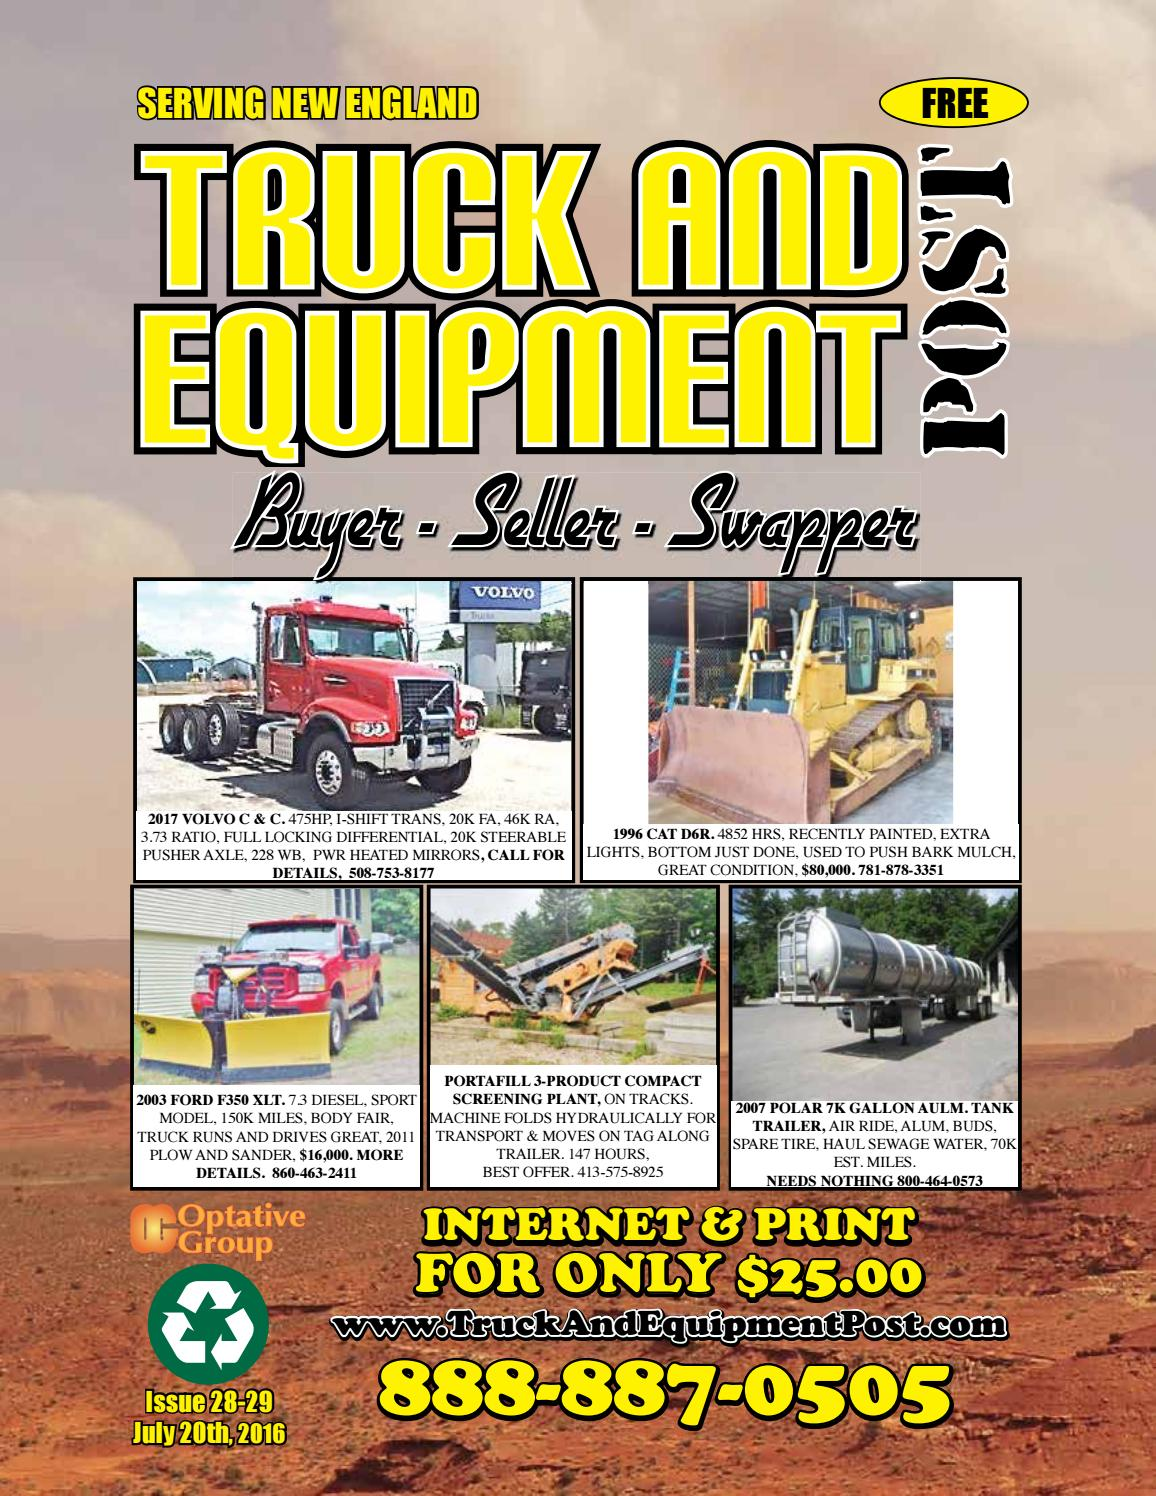 Truck Equipment Post 28 29 2016 By 1clickaway Issuu Pacar W900 Fuse Diagram 2001